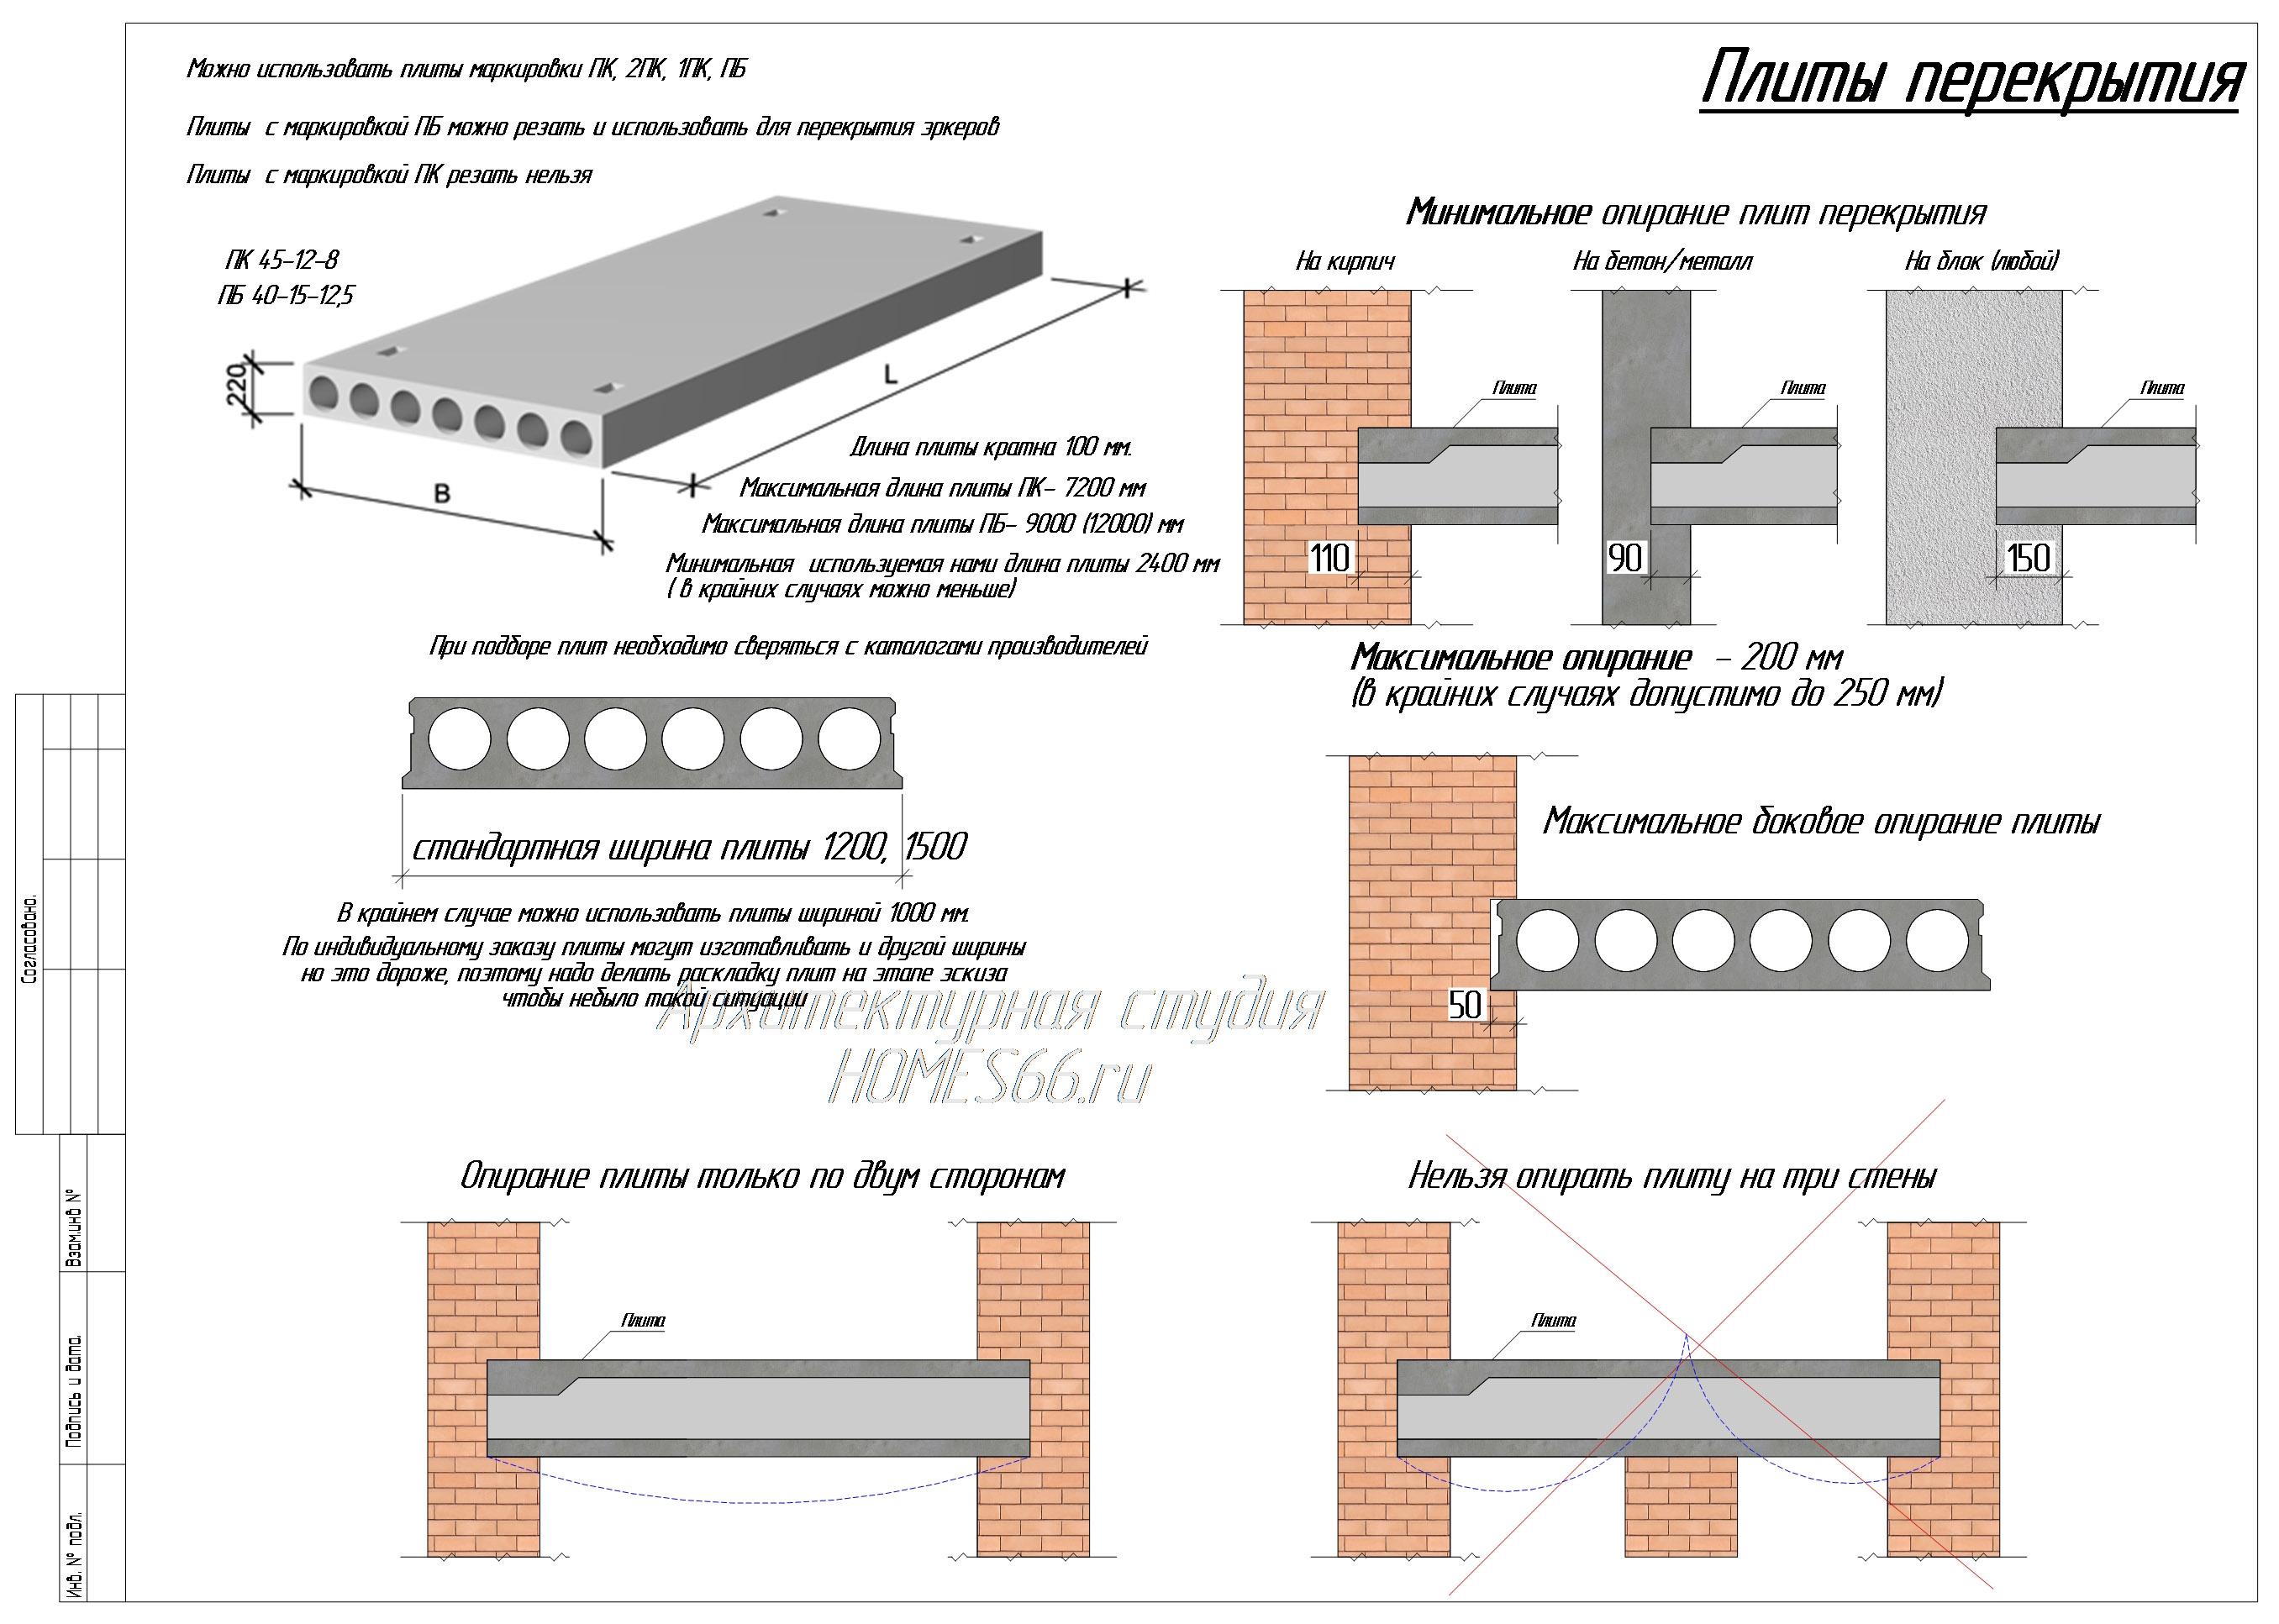 Стандартная плита перекрытия ширина железобетонное перекрытие газобетонного дома